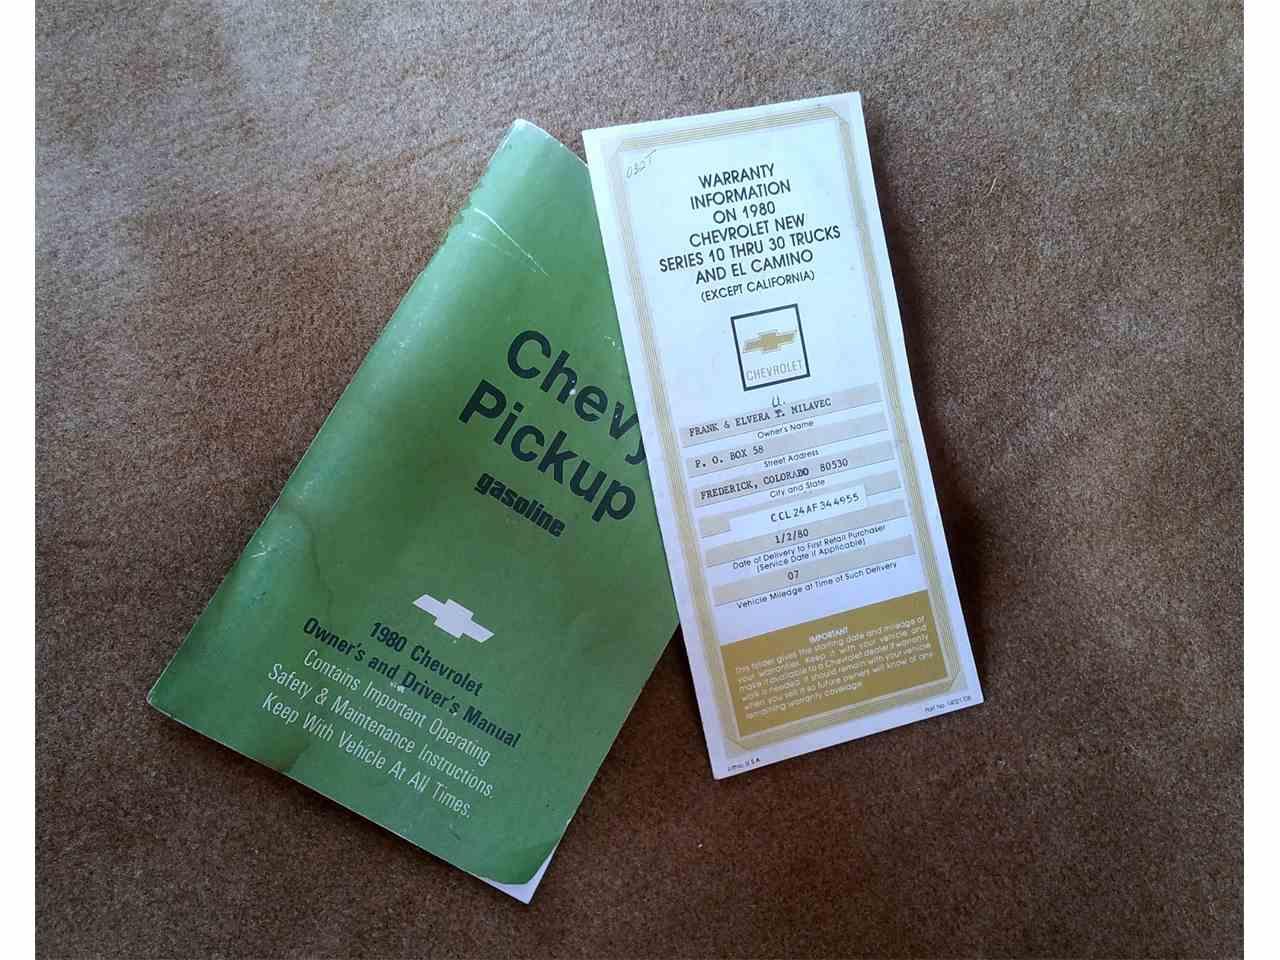 1980 Chevrolet C10 for Sale | ClassicCars.com | CC-1017661